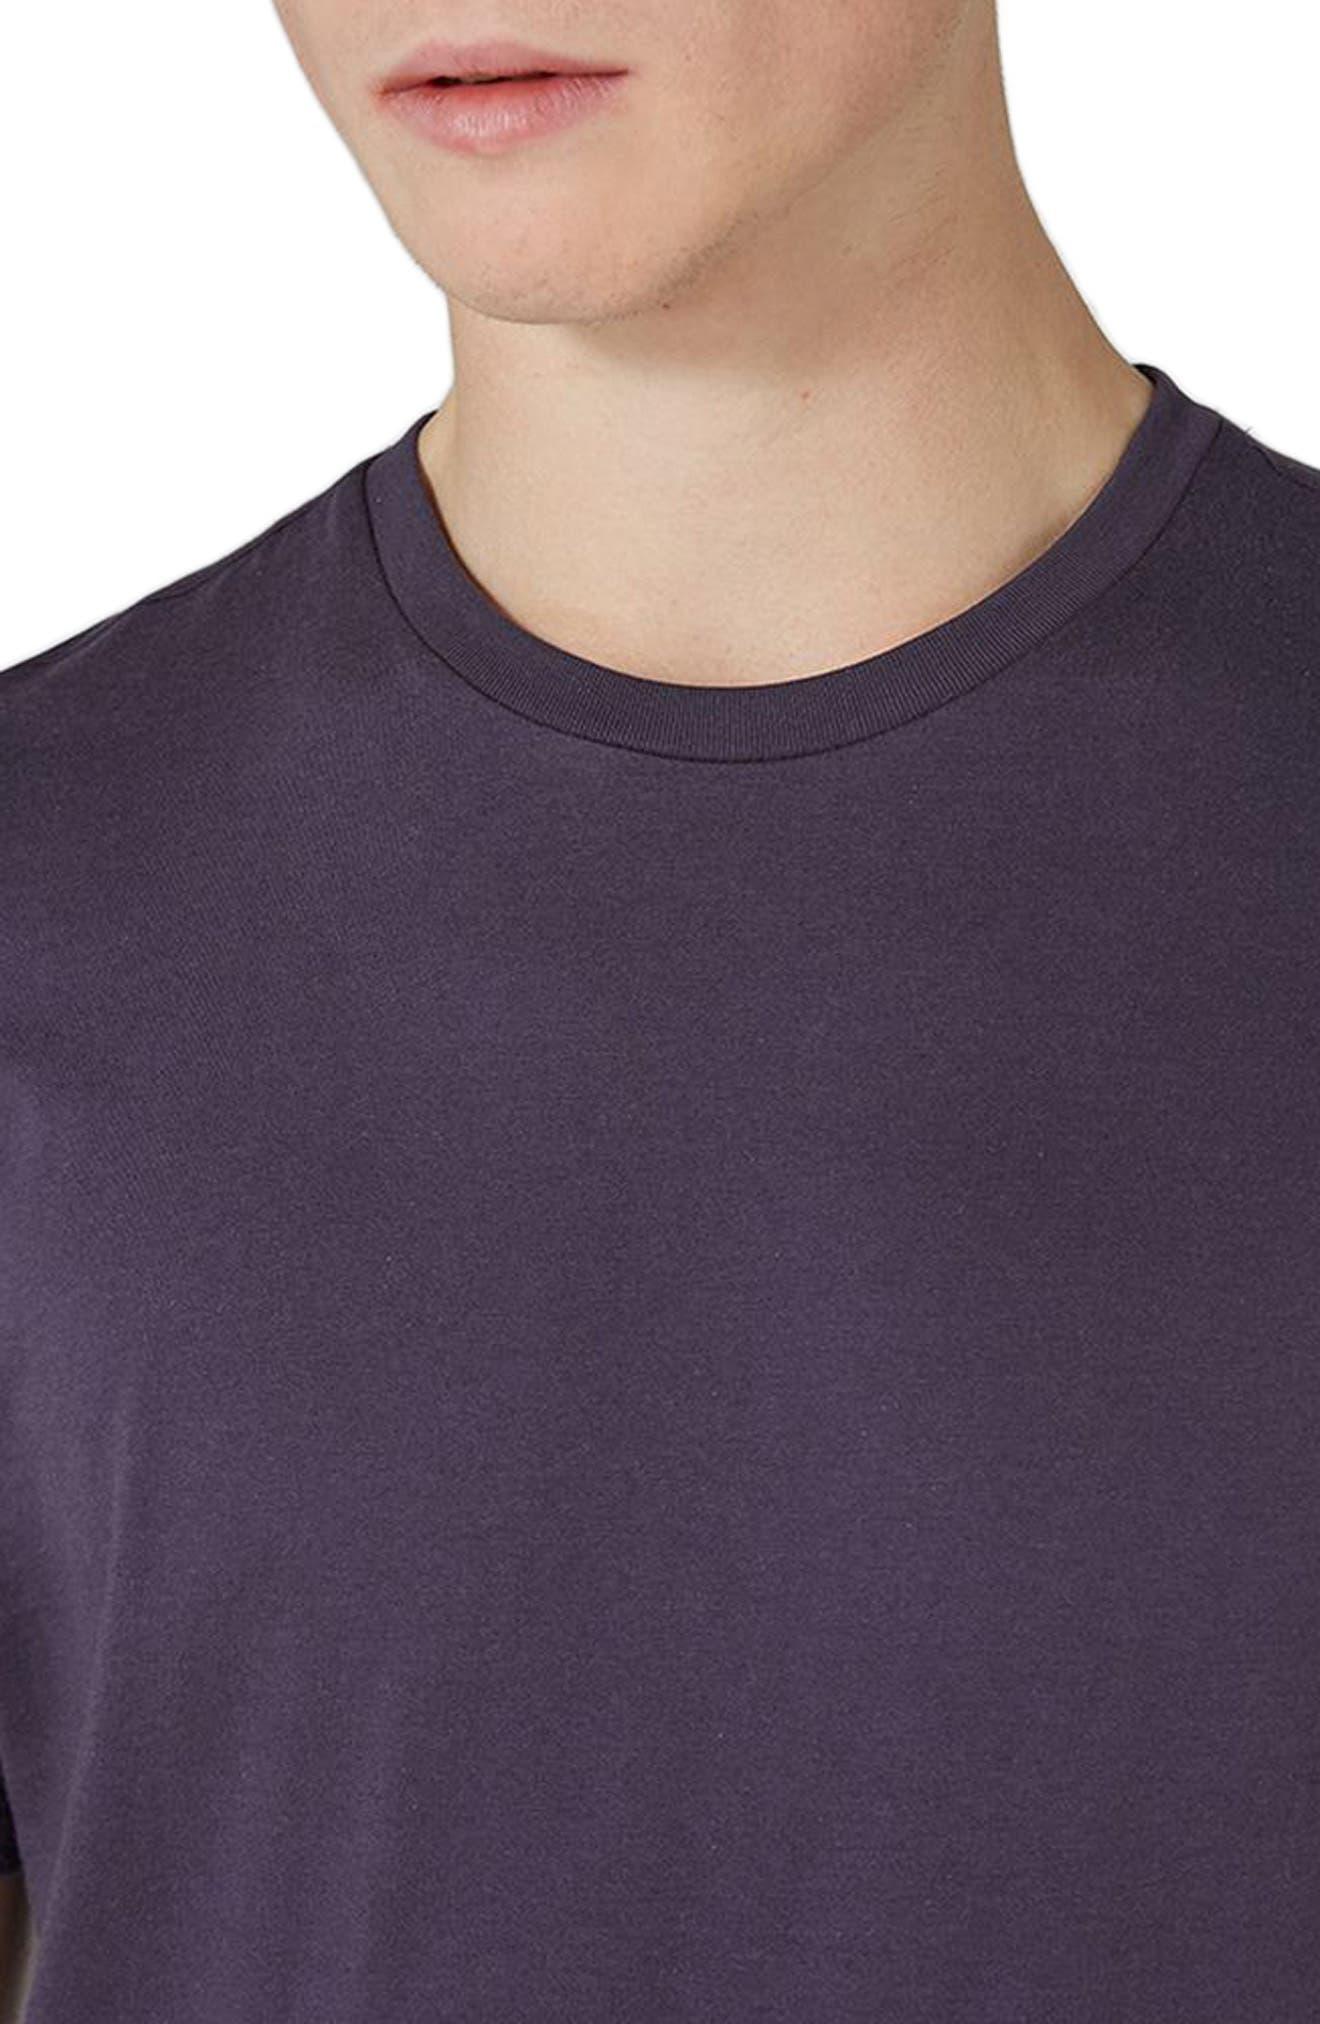 Slim Fit Crewneck T-Shirt,                             Alternate thumbnail 208, color,